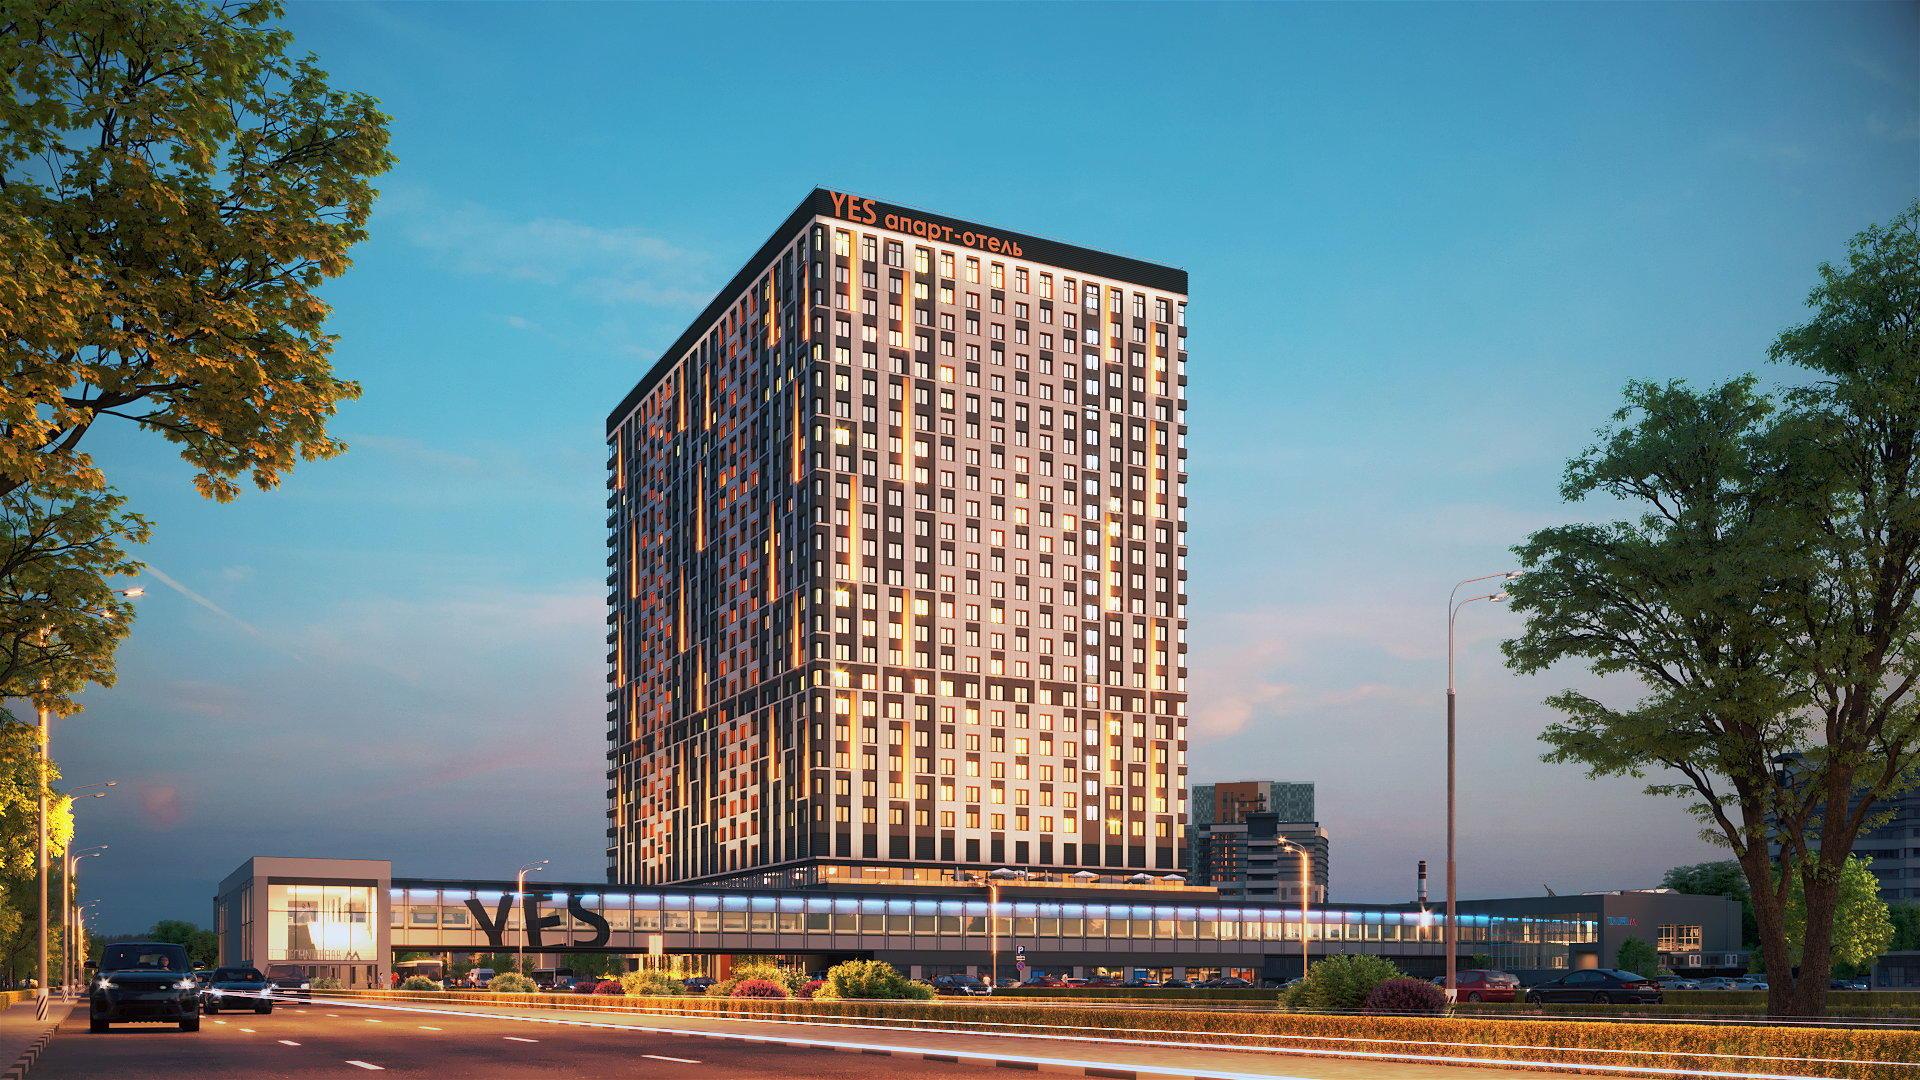 Апарт-отель YE'S Технопарк